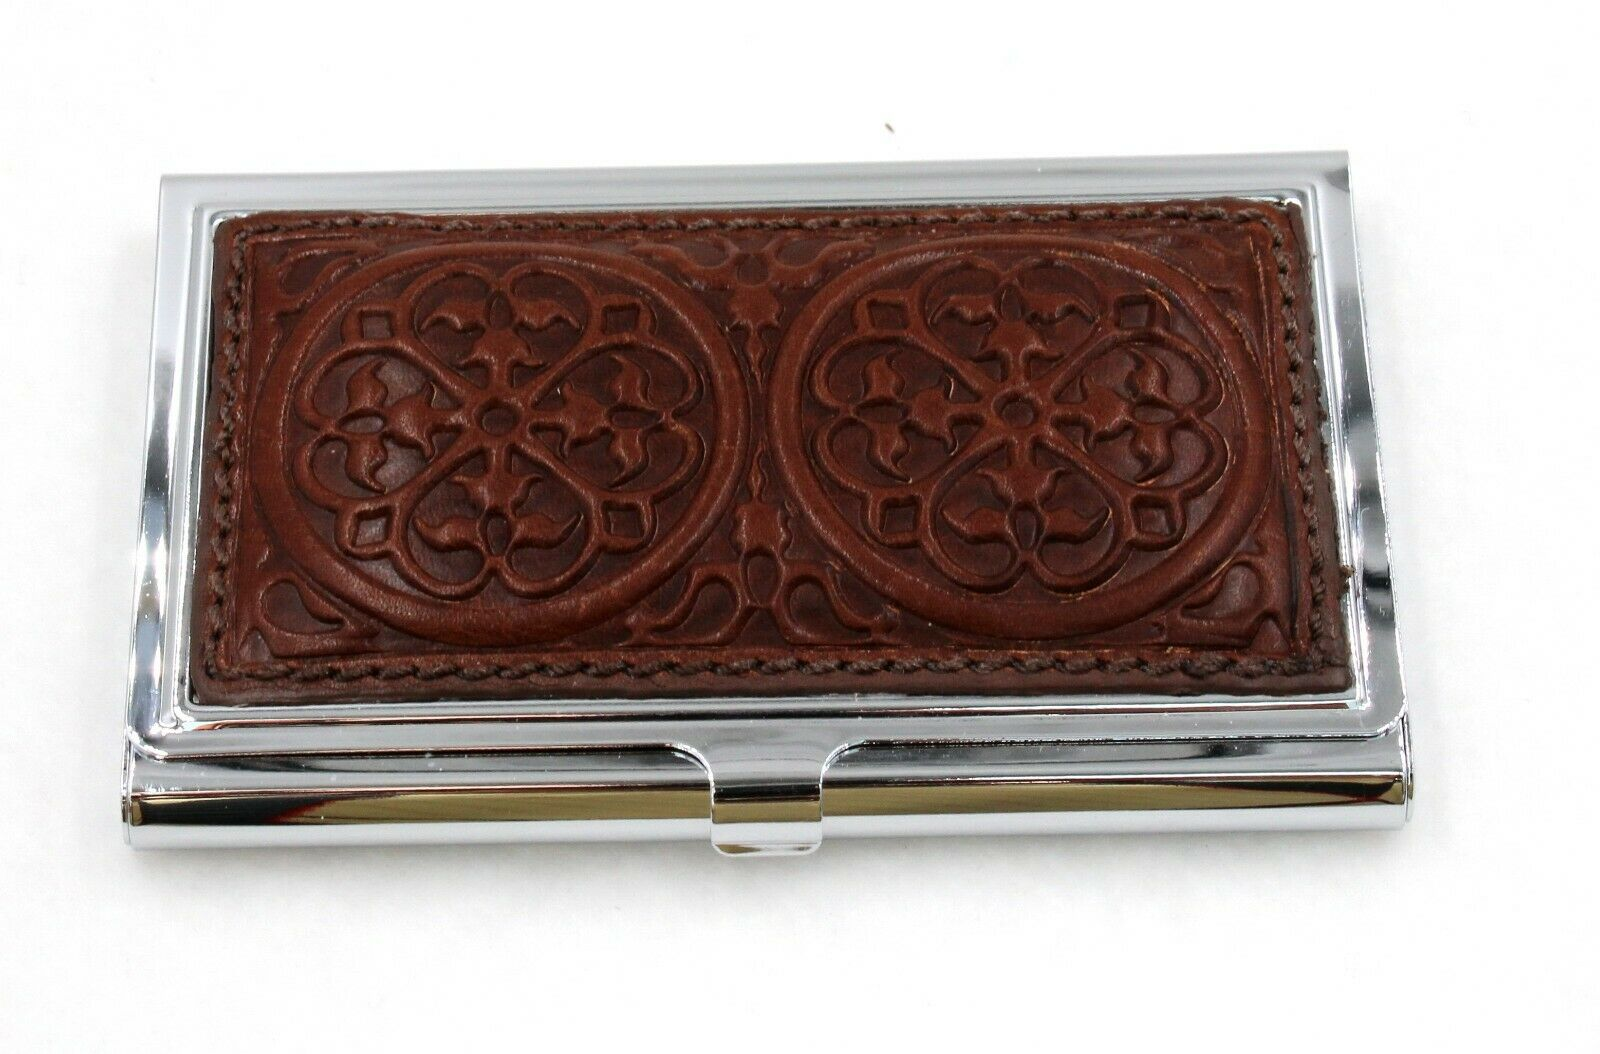 BRIGHTON Ferrara Motif Tan Hard Business Card Case Holder Compact E5356W NEW